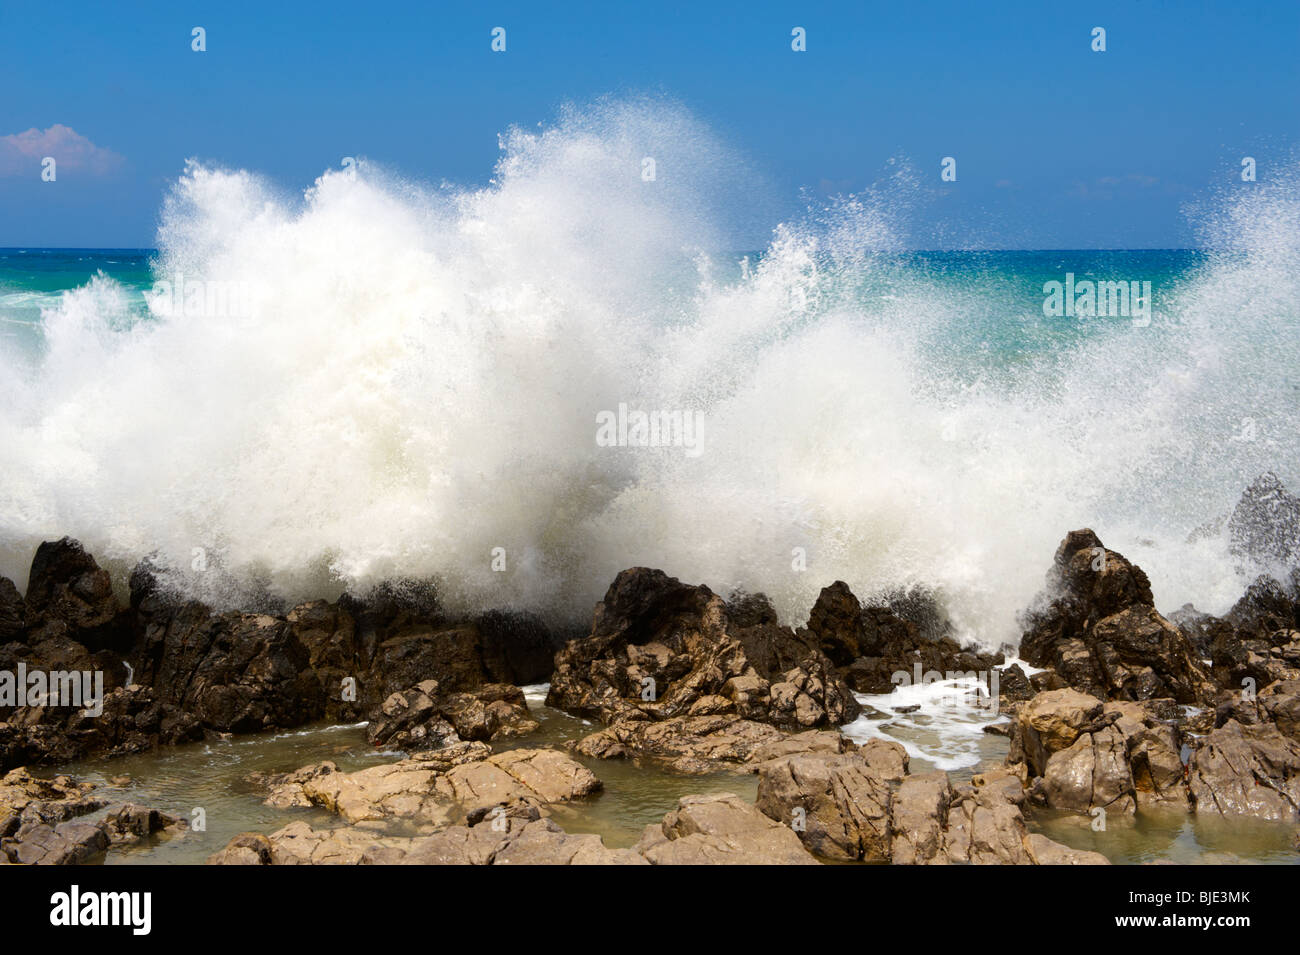 waves crashing on the rocks at Cefalu [Cefaú] Sicily - Stock Image